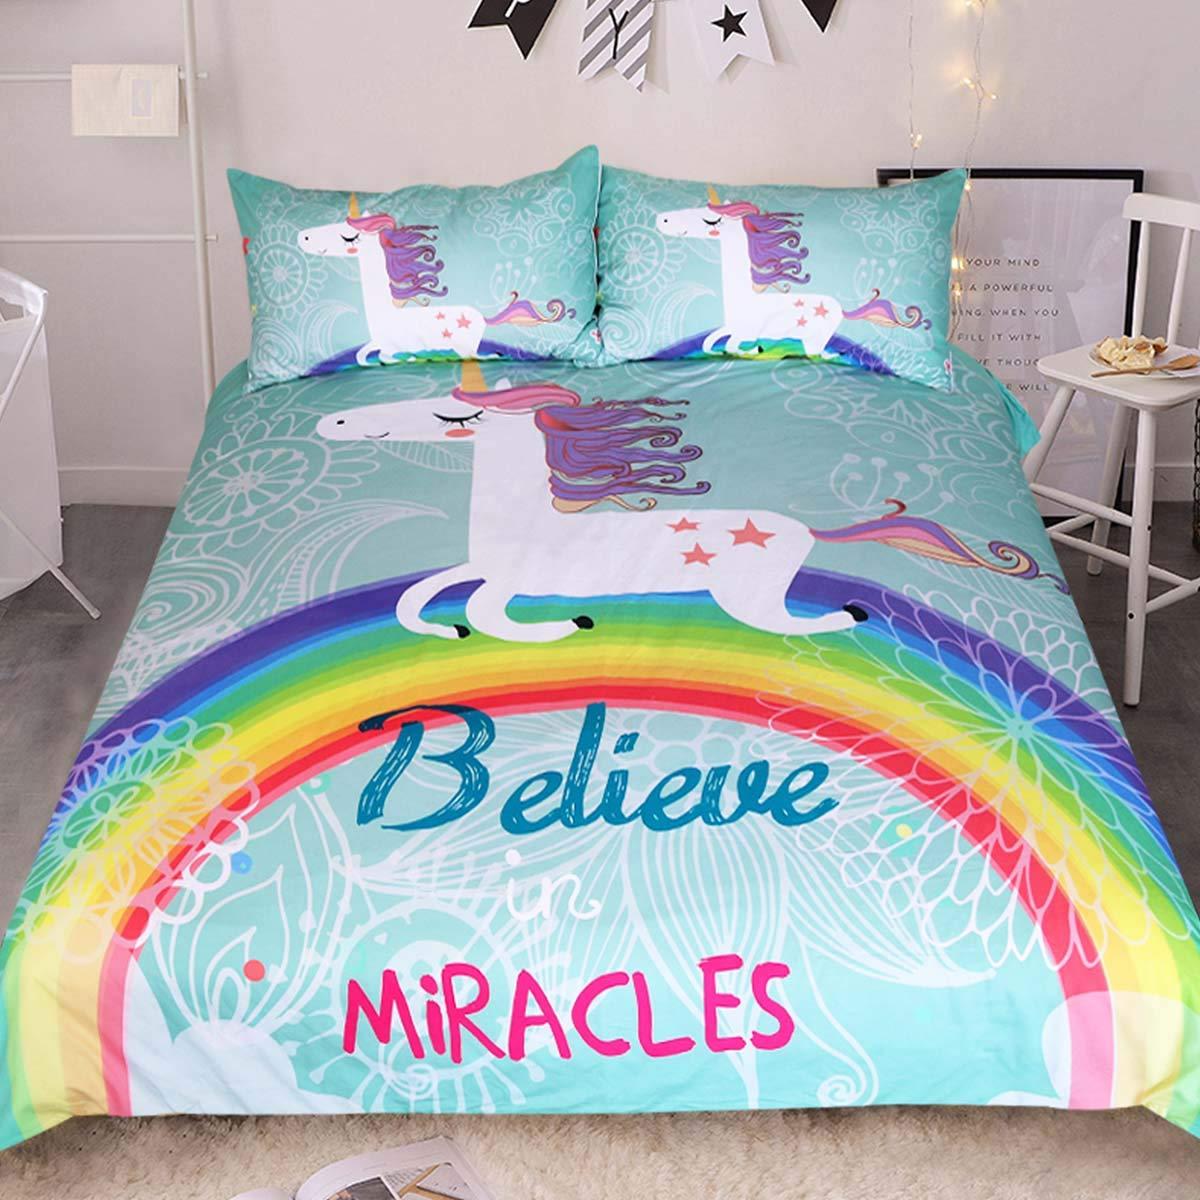 Sleepwish White Unicorn Bedding Rainbow Unicorn Duvet Cover 3 Piece Mint Green Kids Girls Cartoon Bed Set Cute Horse Gifts (Full)